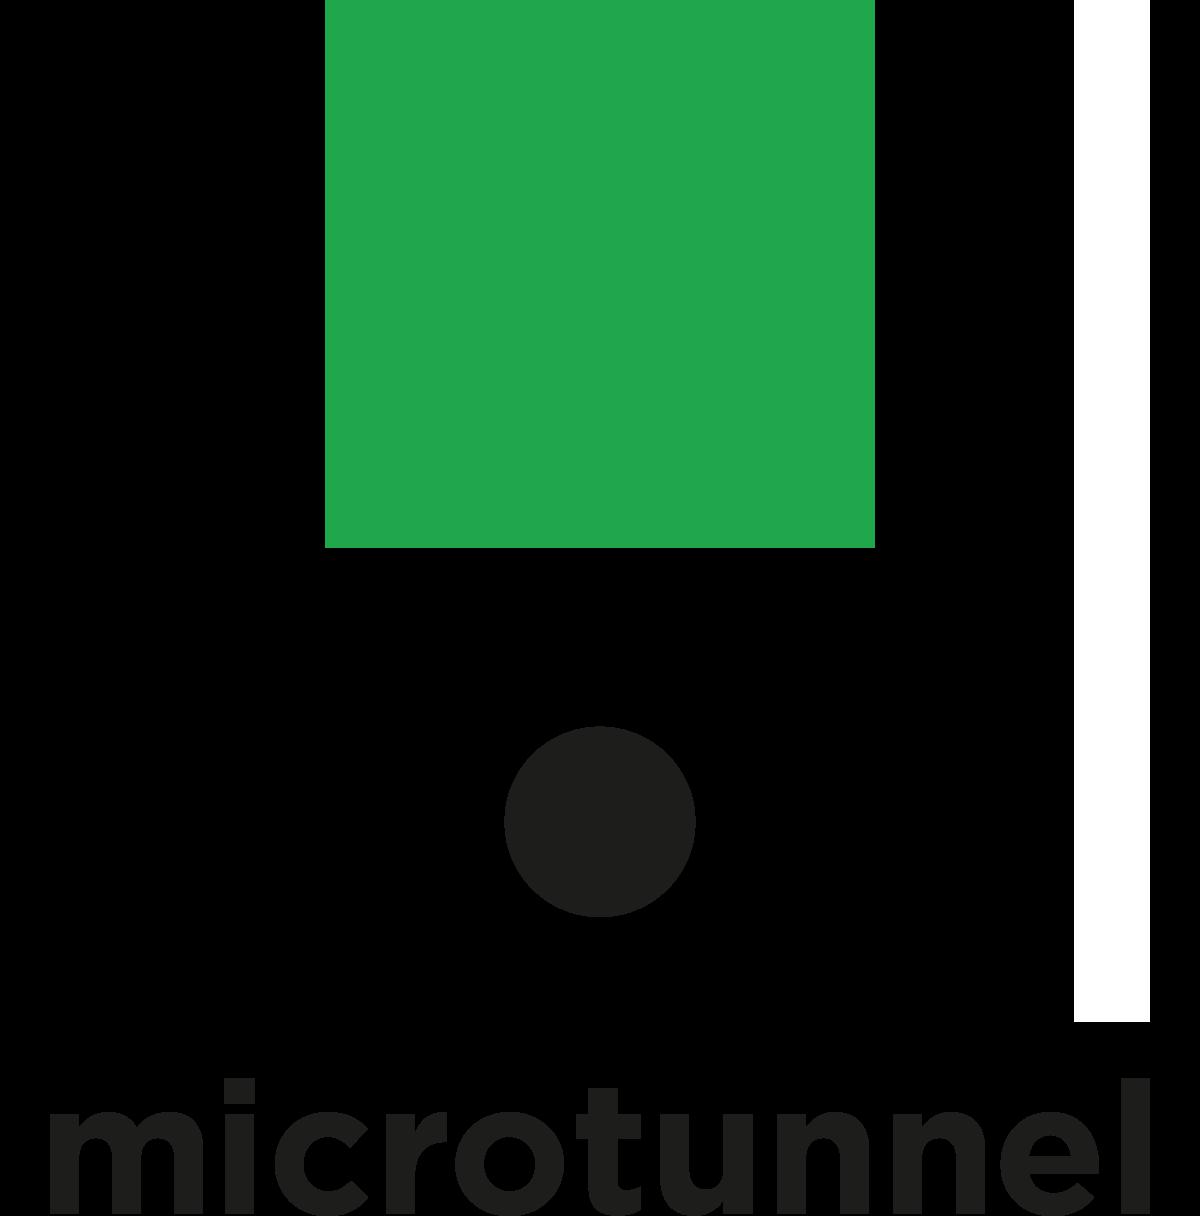 Microtunnel